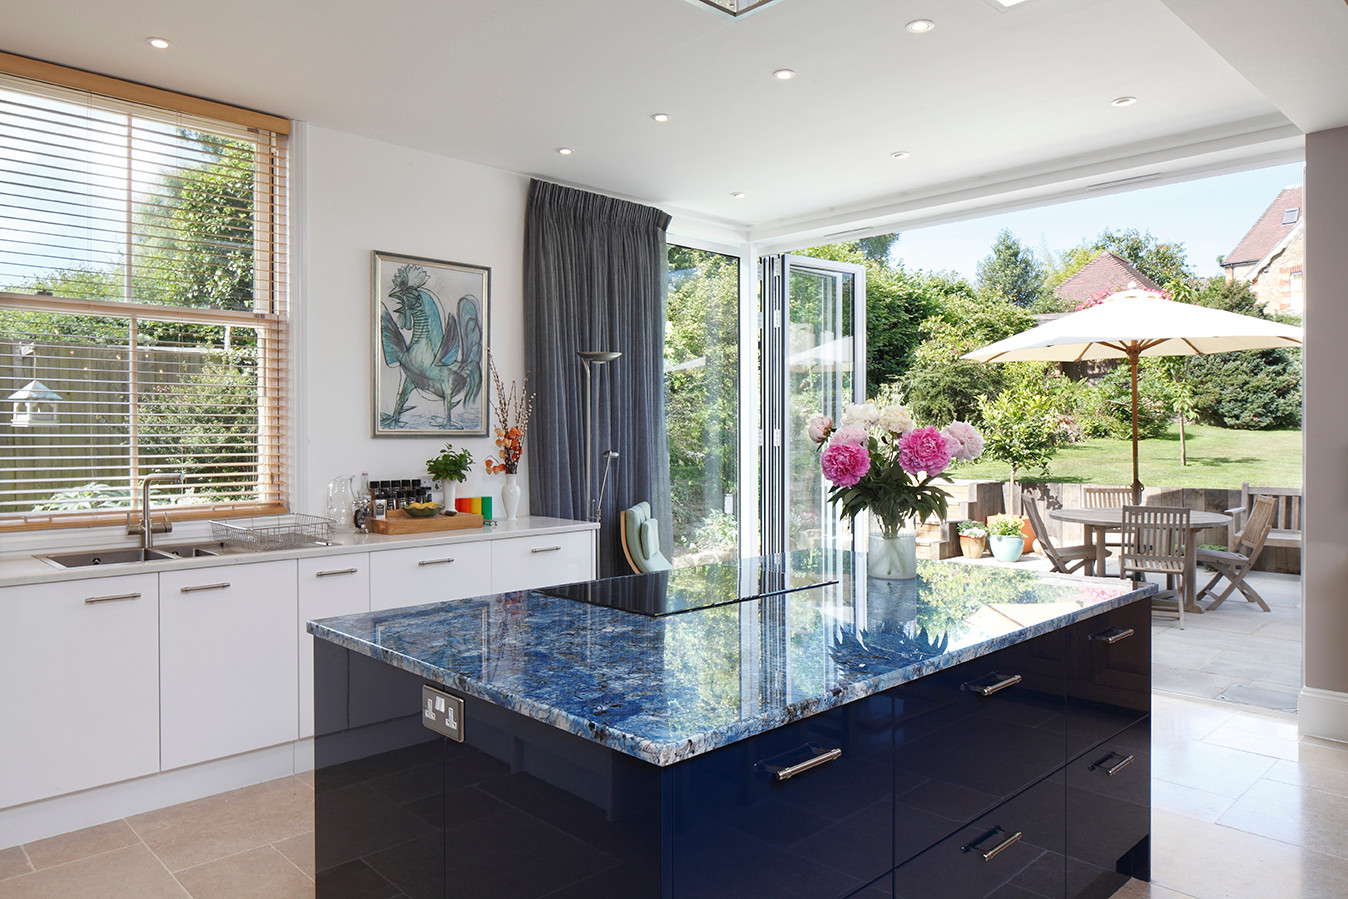 Kitchen Extension with Bifolding Doors